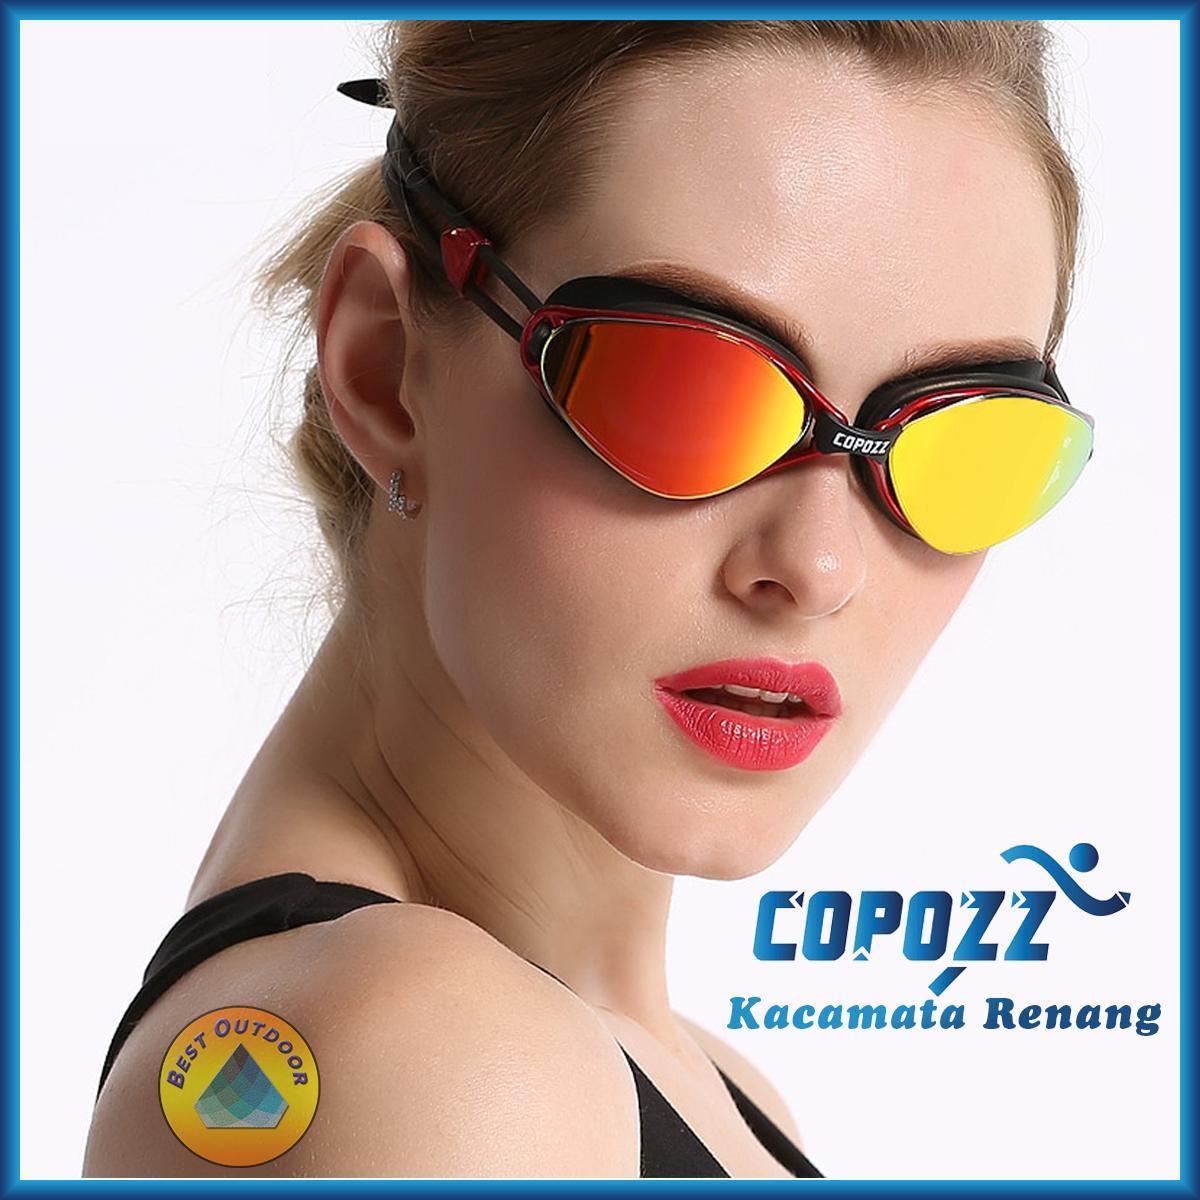 Kacamata Renang NEW Copozz Profesional Anti-Fog Perlindungan UV untuk Pria  dan Wanita Tahan Air d2bbf62709